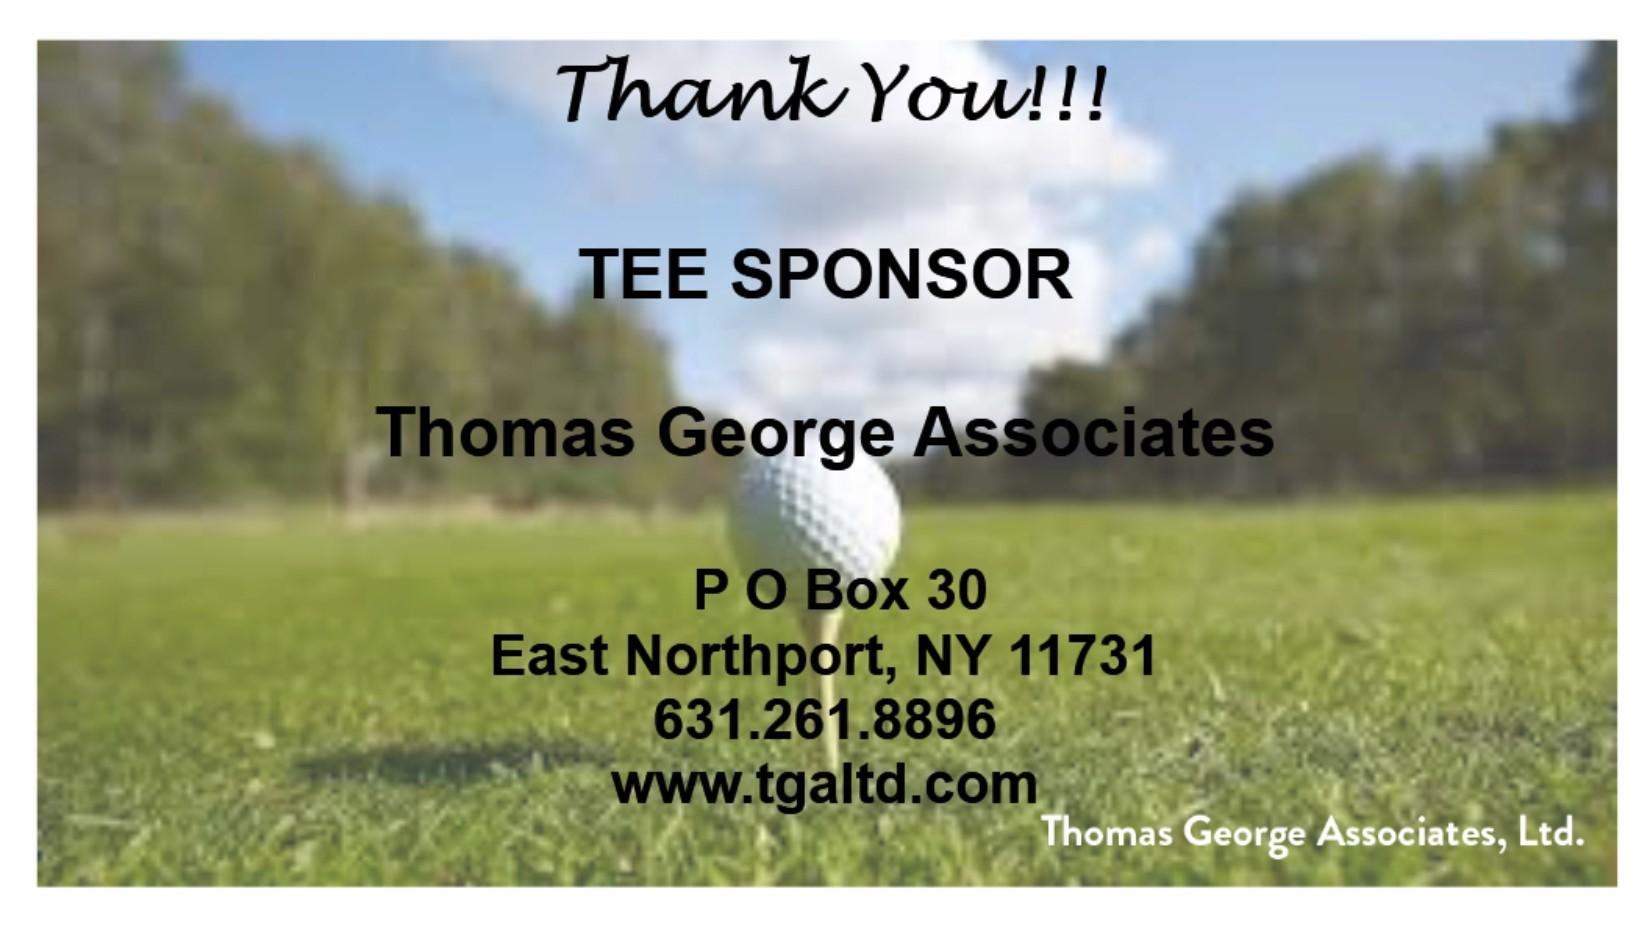 Thomas George Associates